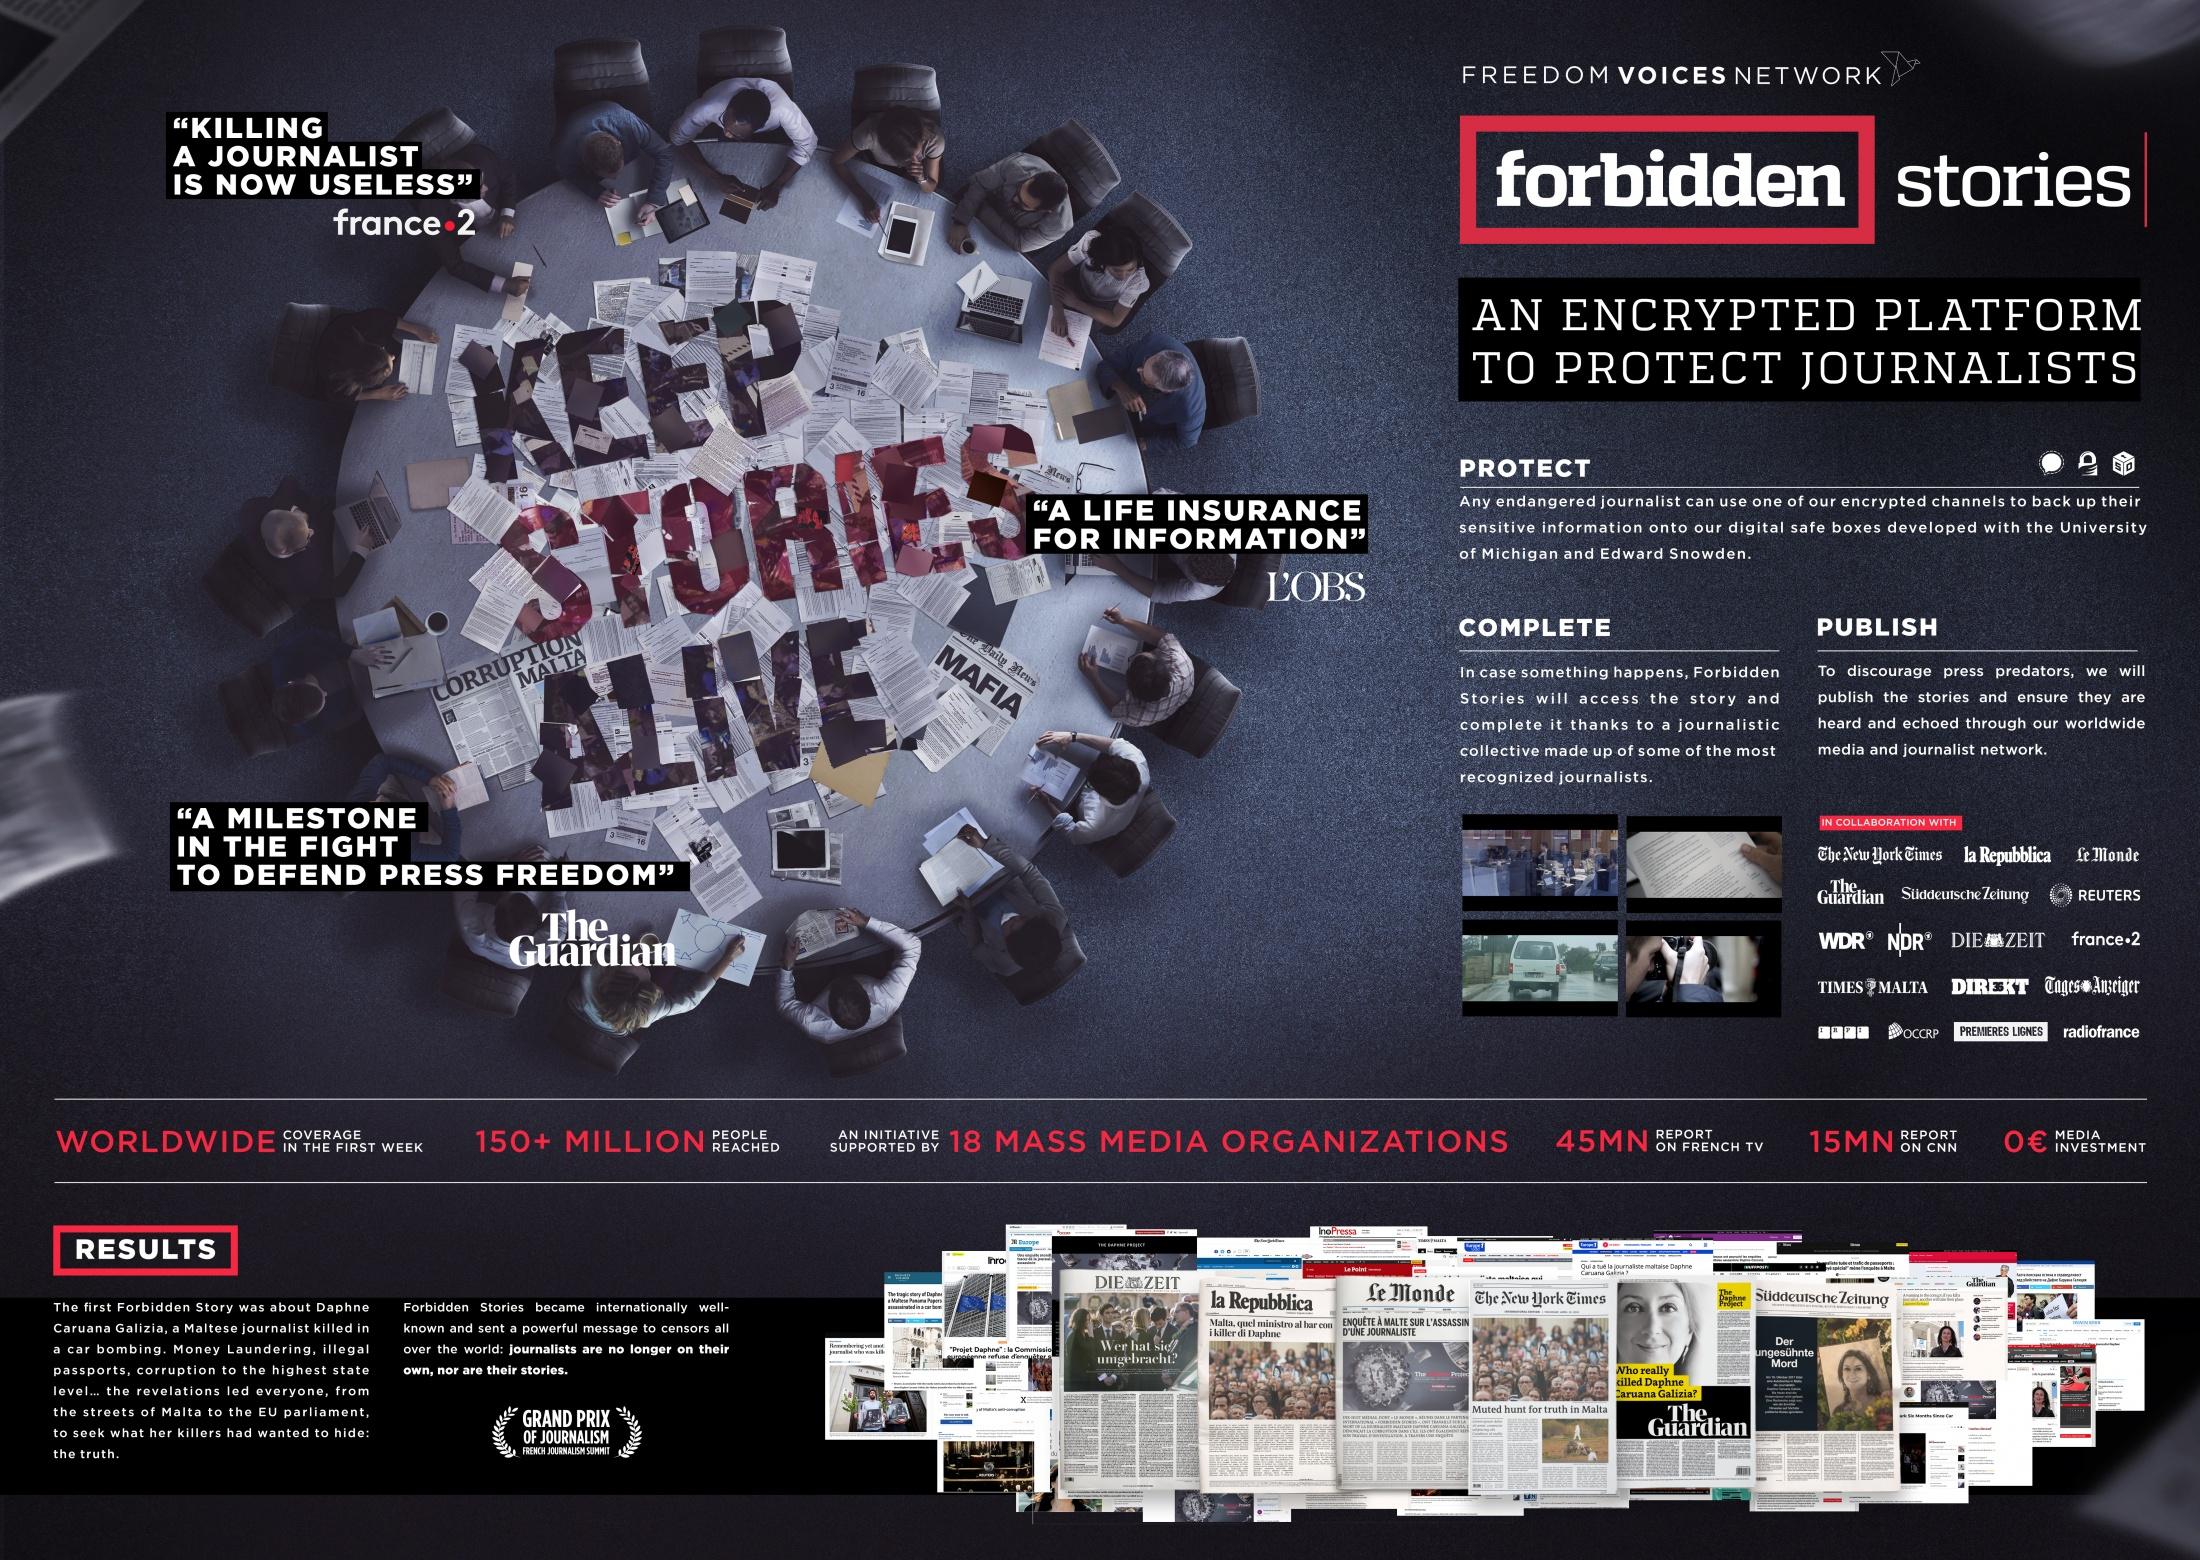 Thumbnail for Forbidden Stories